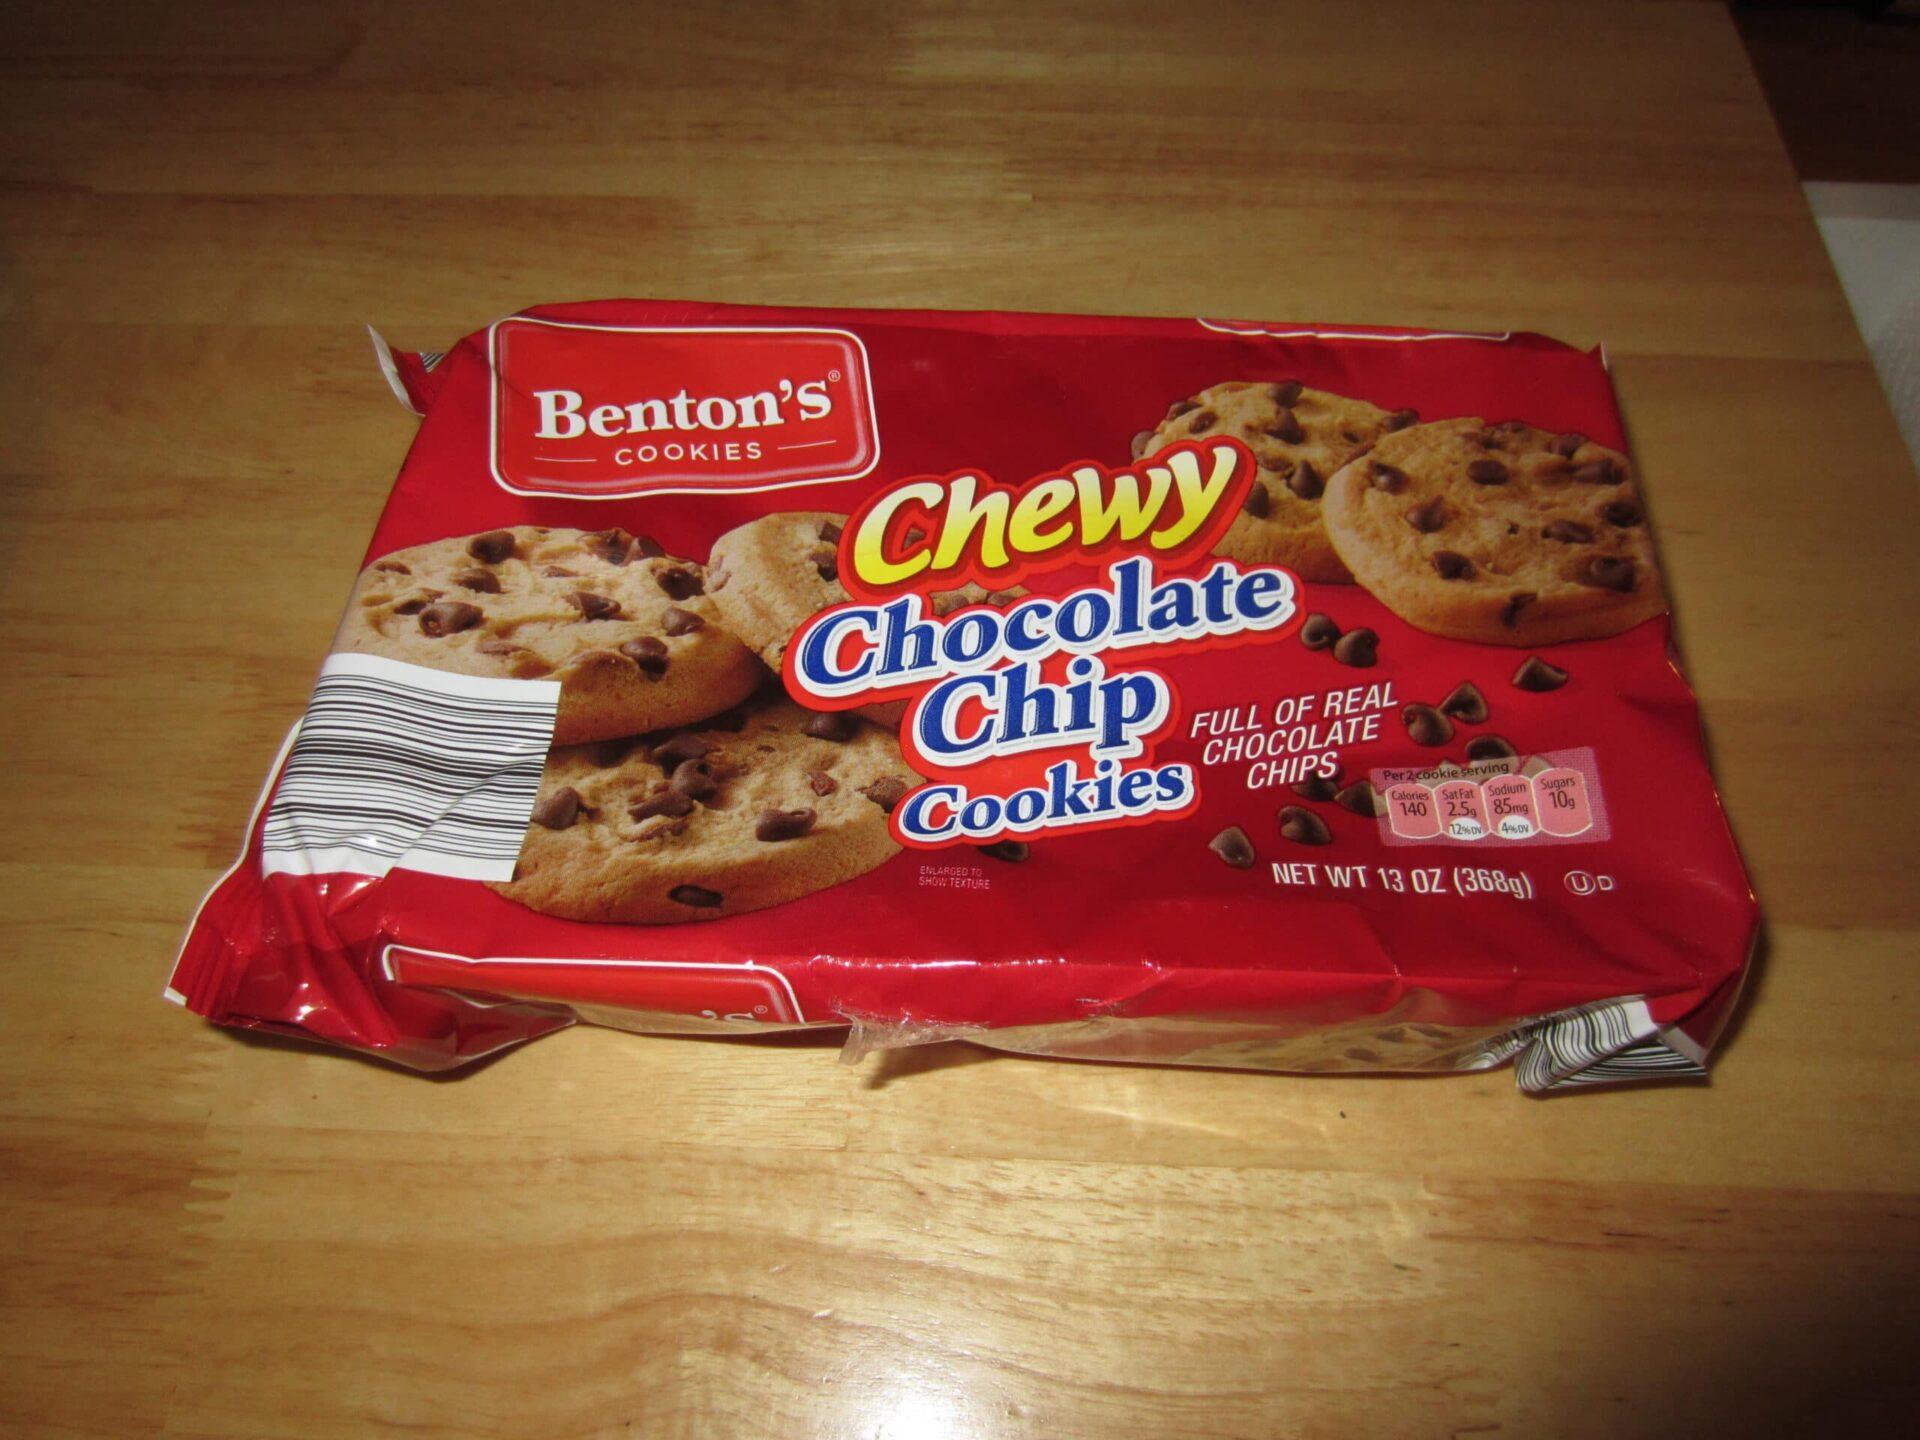 Benton's Chewy Chocolate Chip Cookies